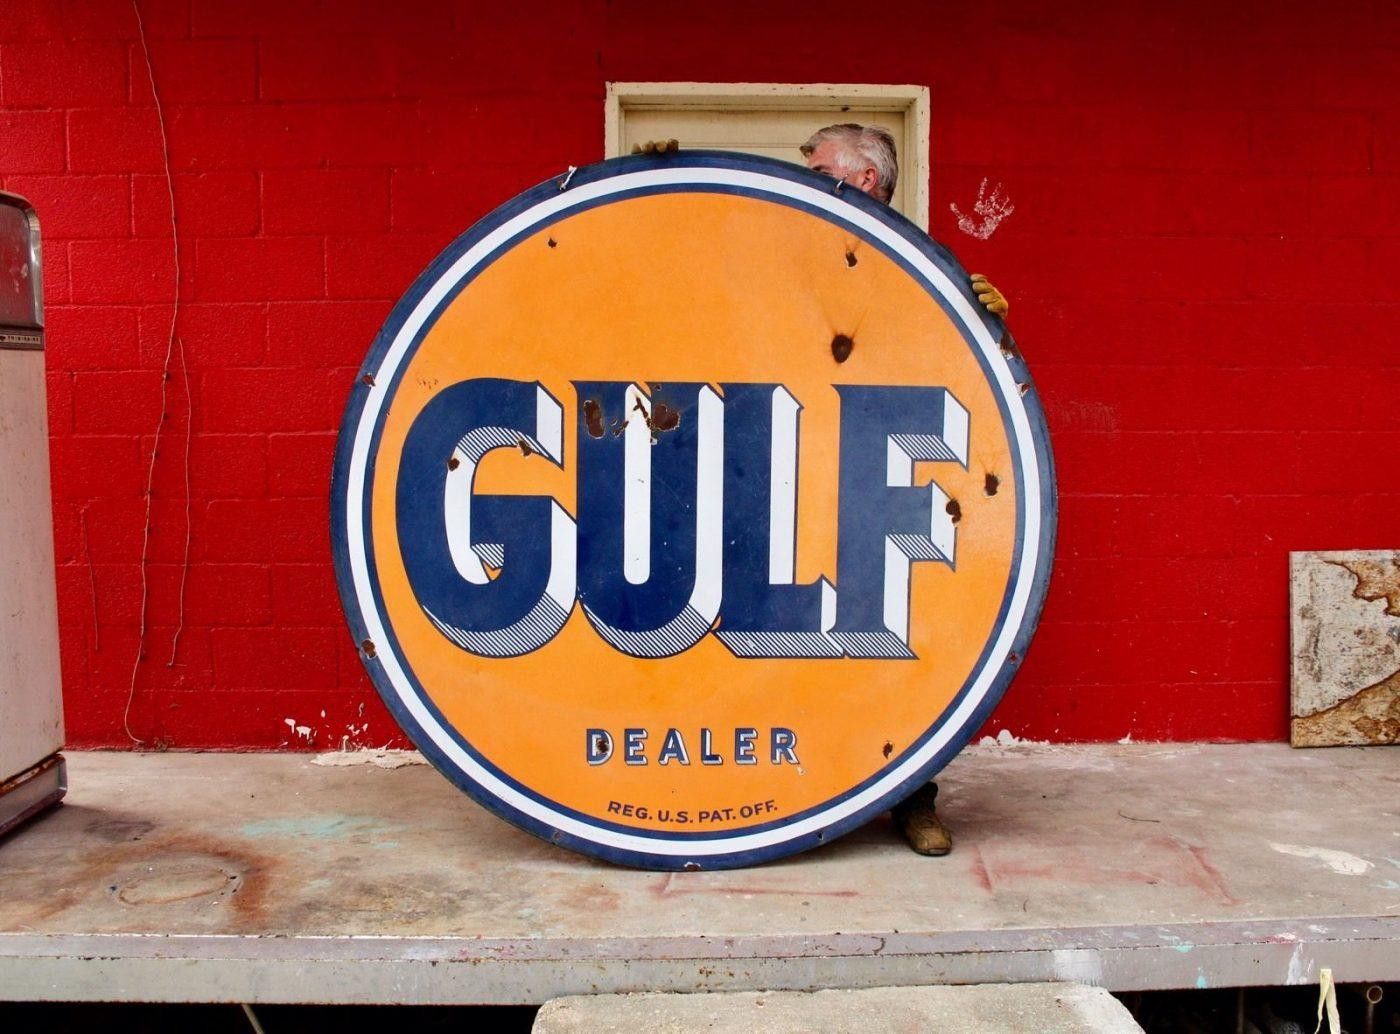 Original 1950's Porcelain Gulf Dealer Advertising Sign!